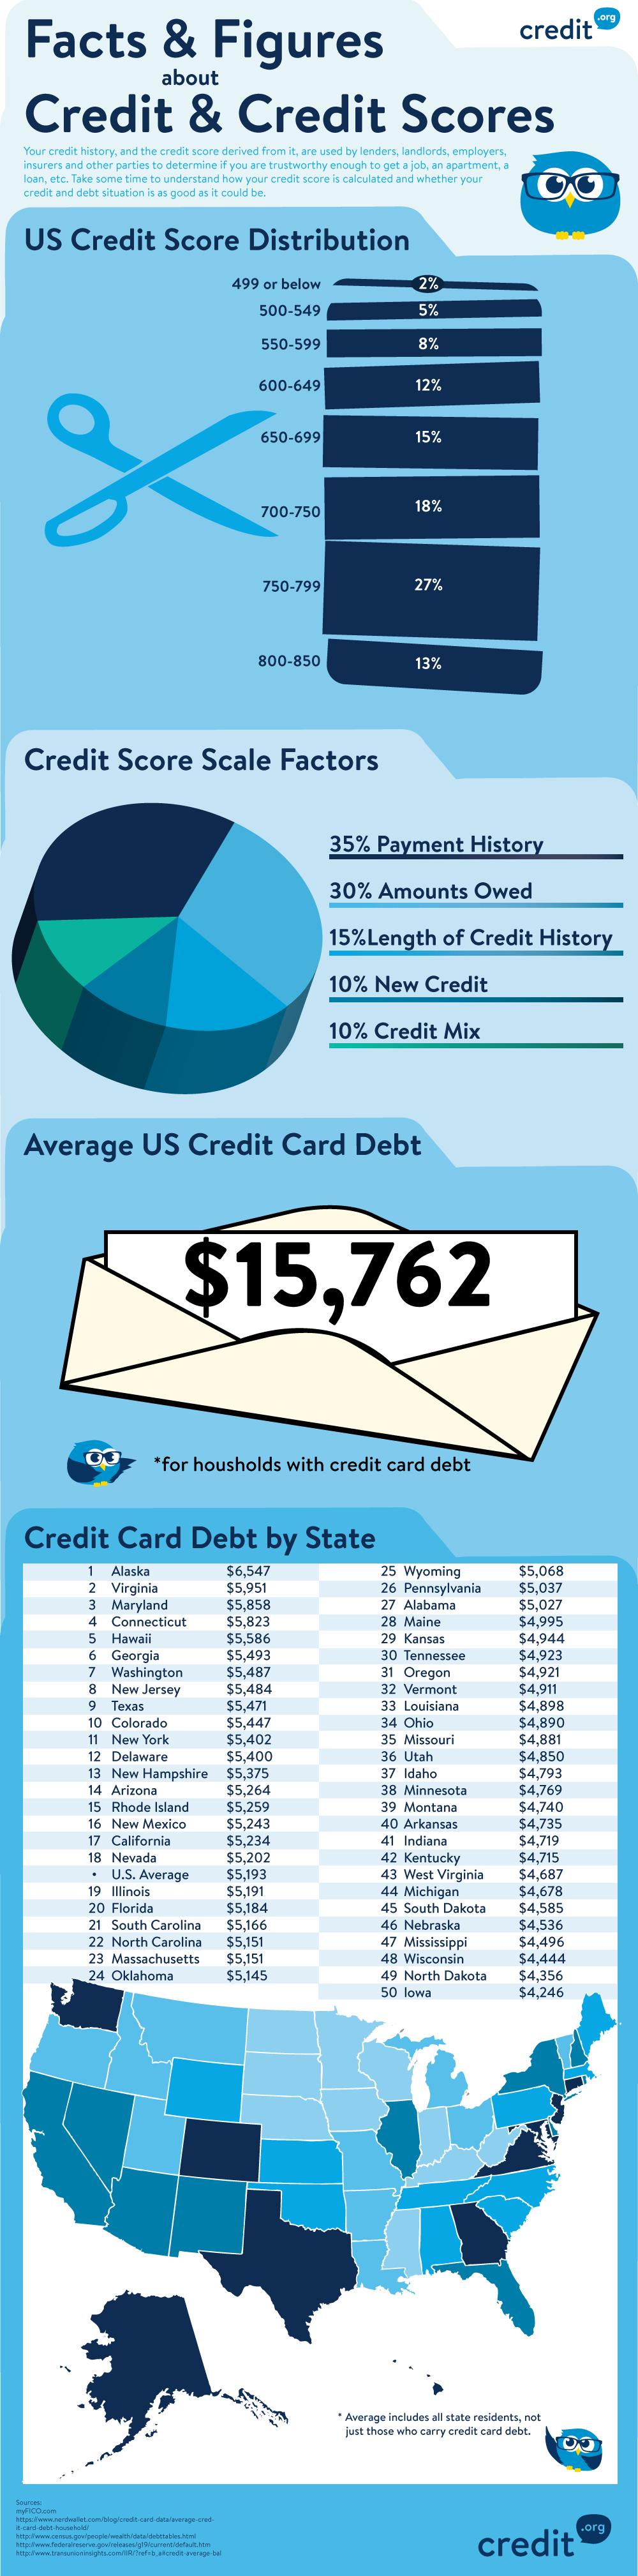 Credit & Credit Scores